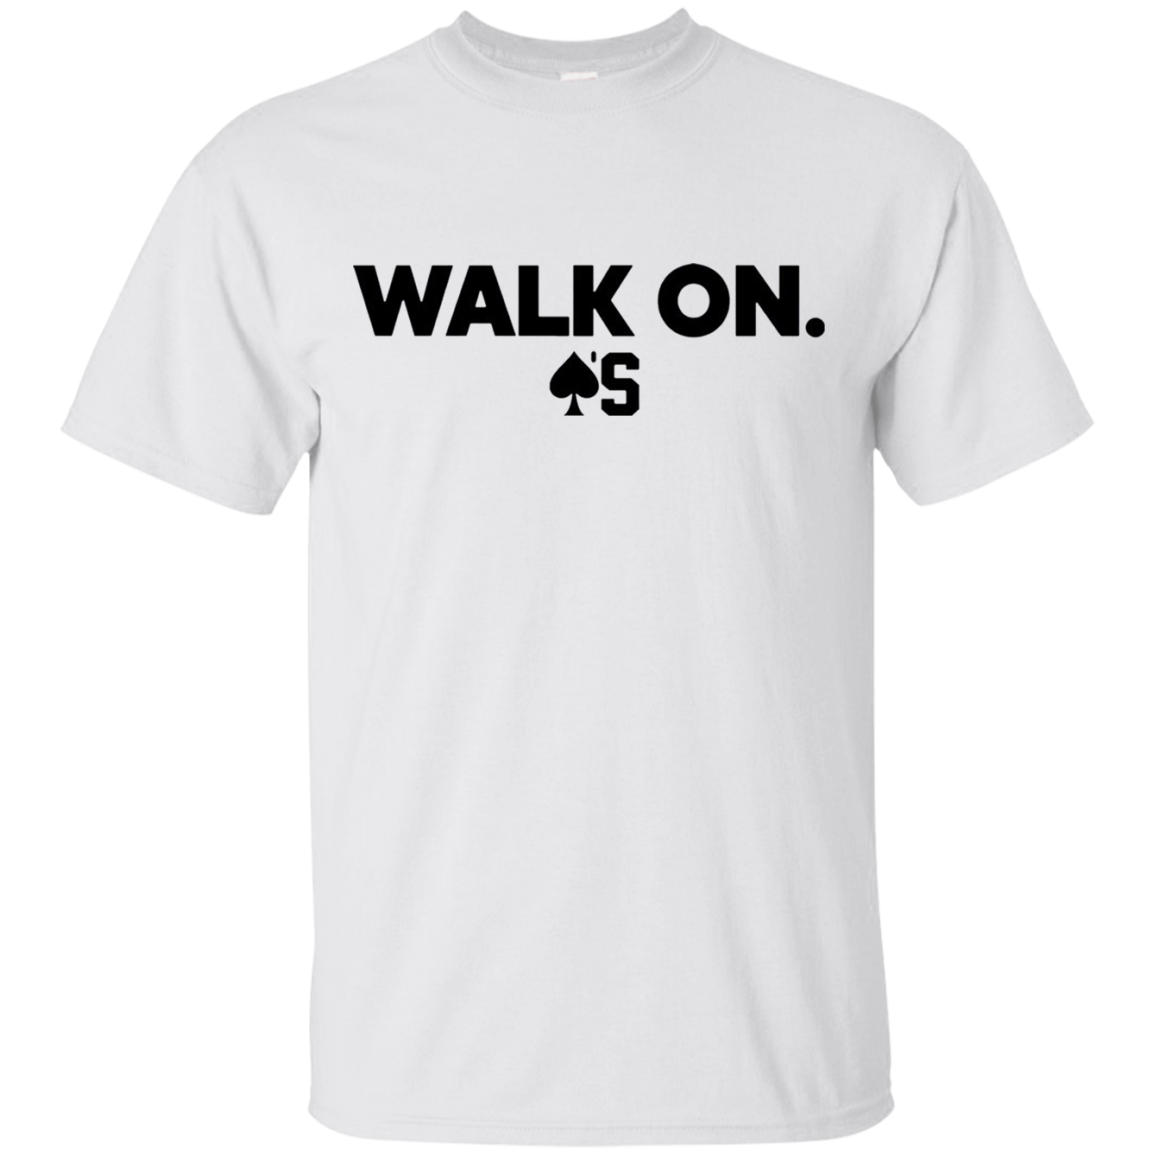 Baker Mayfield Walk On Shirt Shirts, Mens tops, Walk on